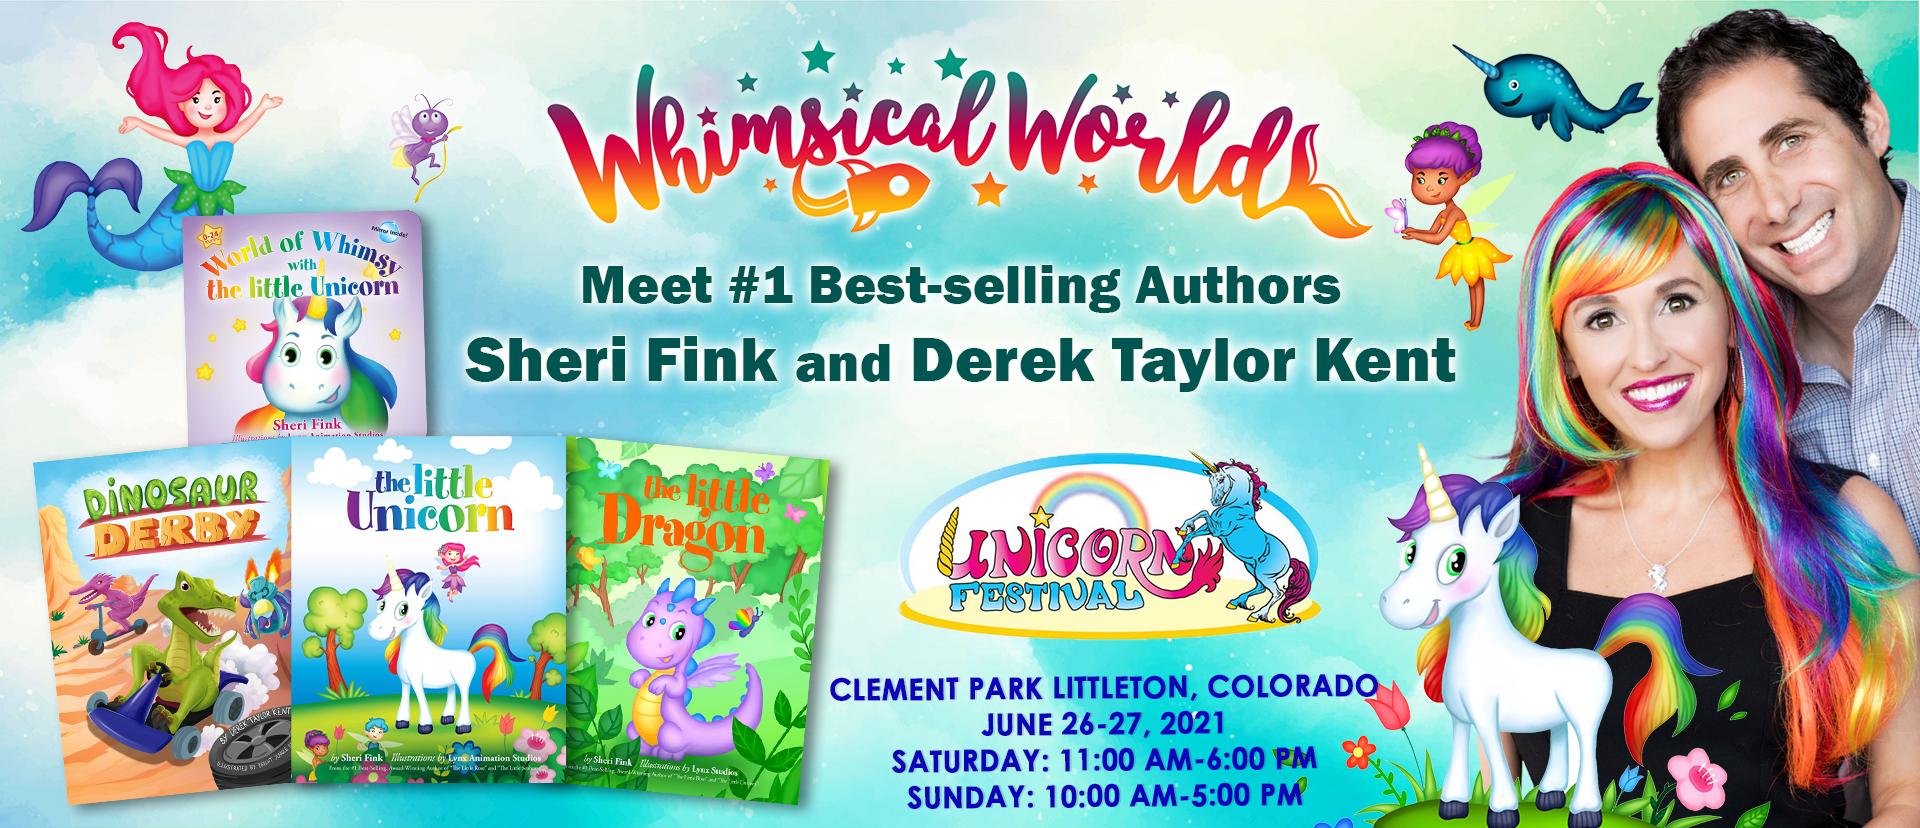 Unicorn Festival fun with Whimsical World Sheri Fink and Derek Taylor Kent